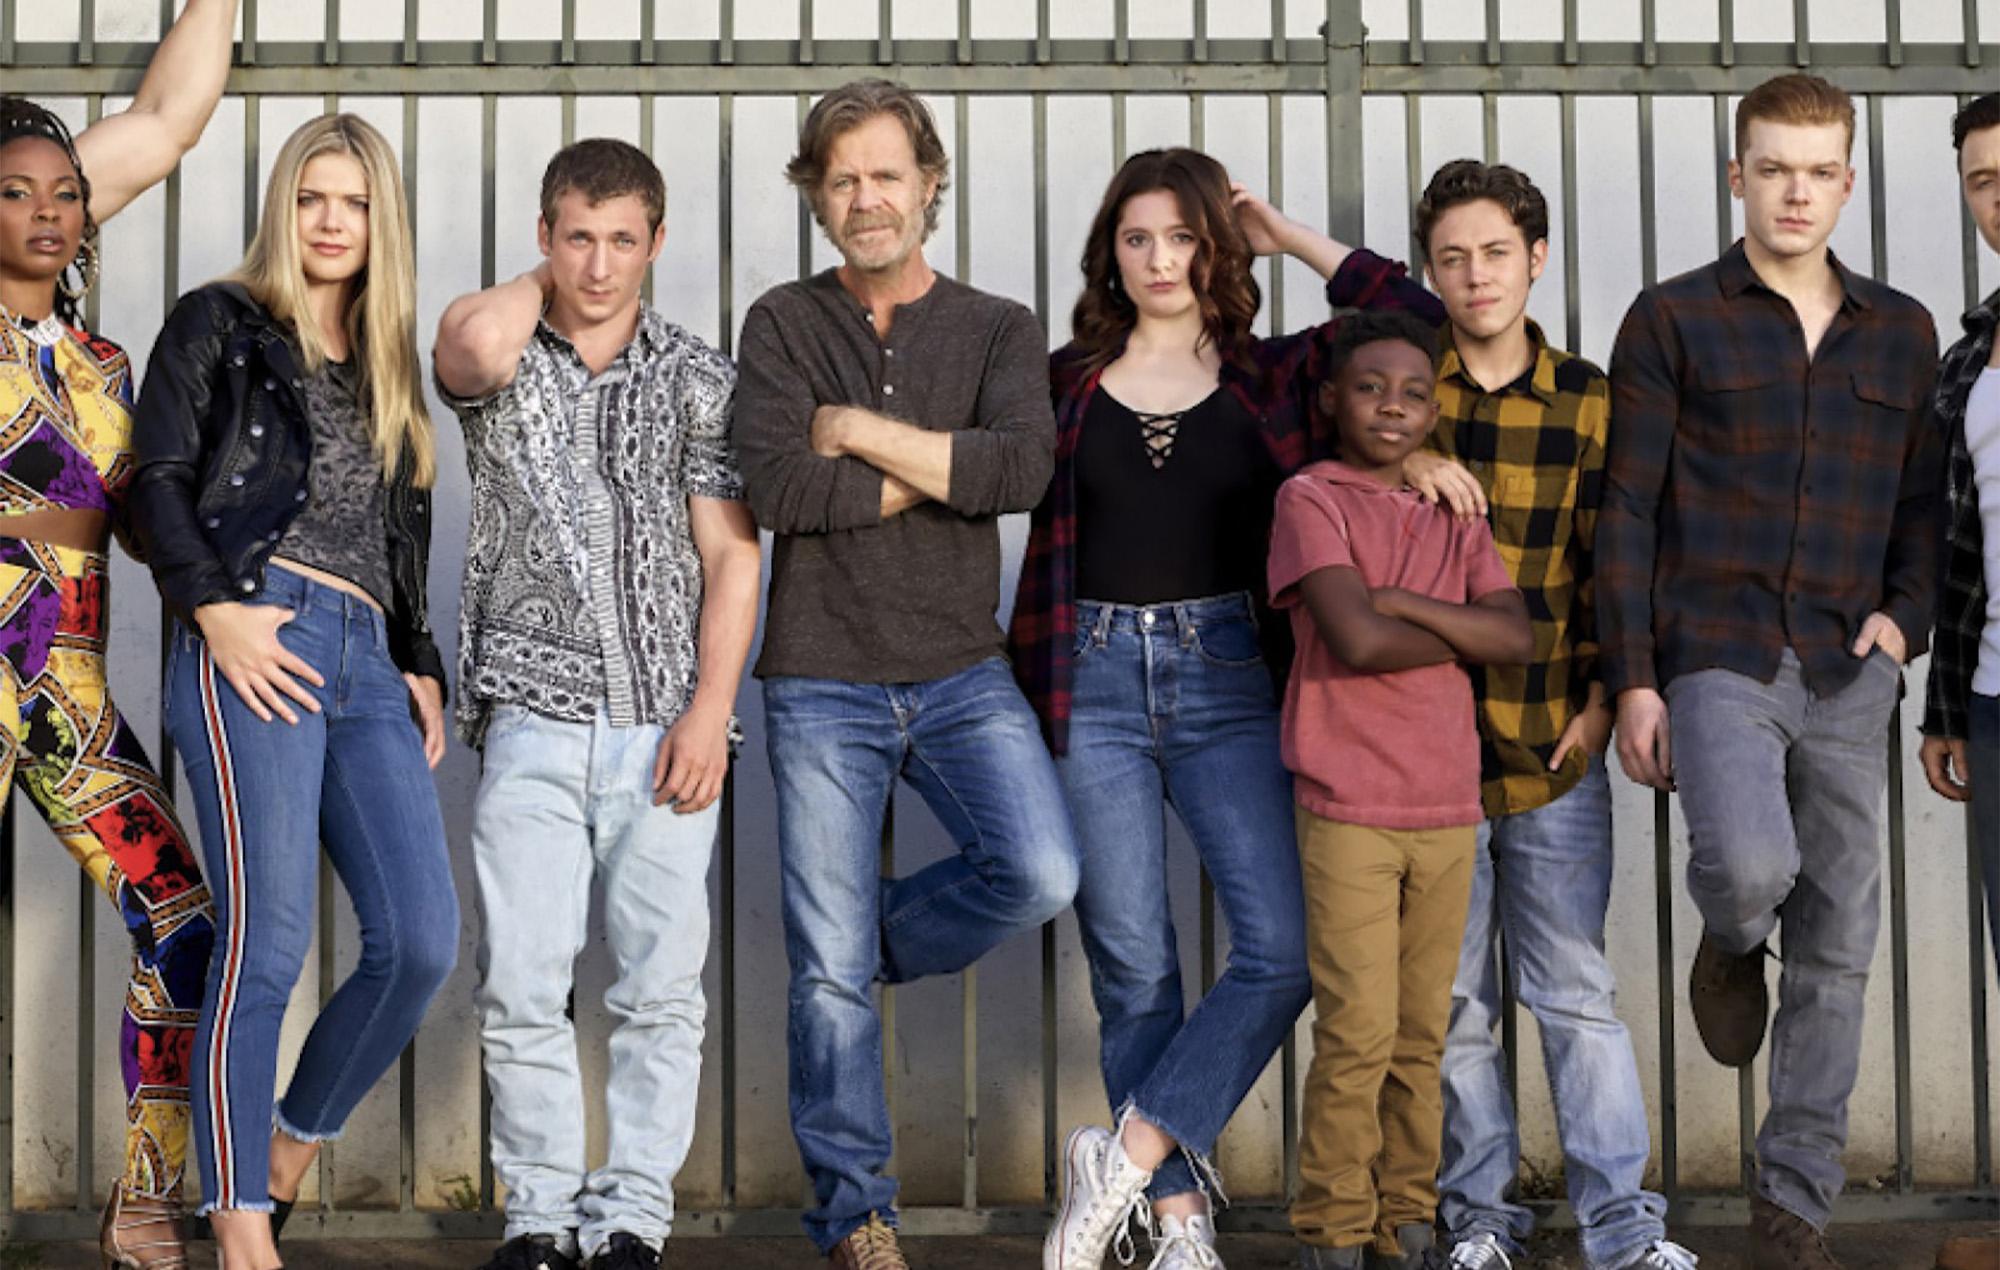 Shameless' final season will include pandemic storyline